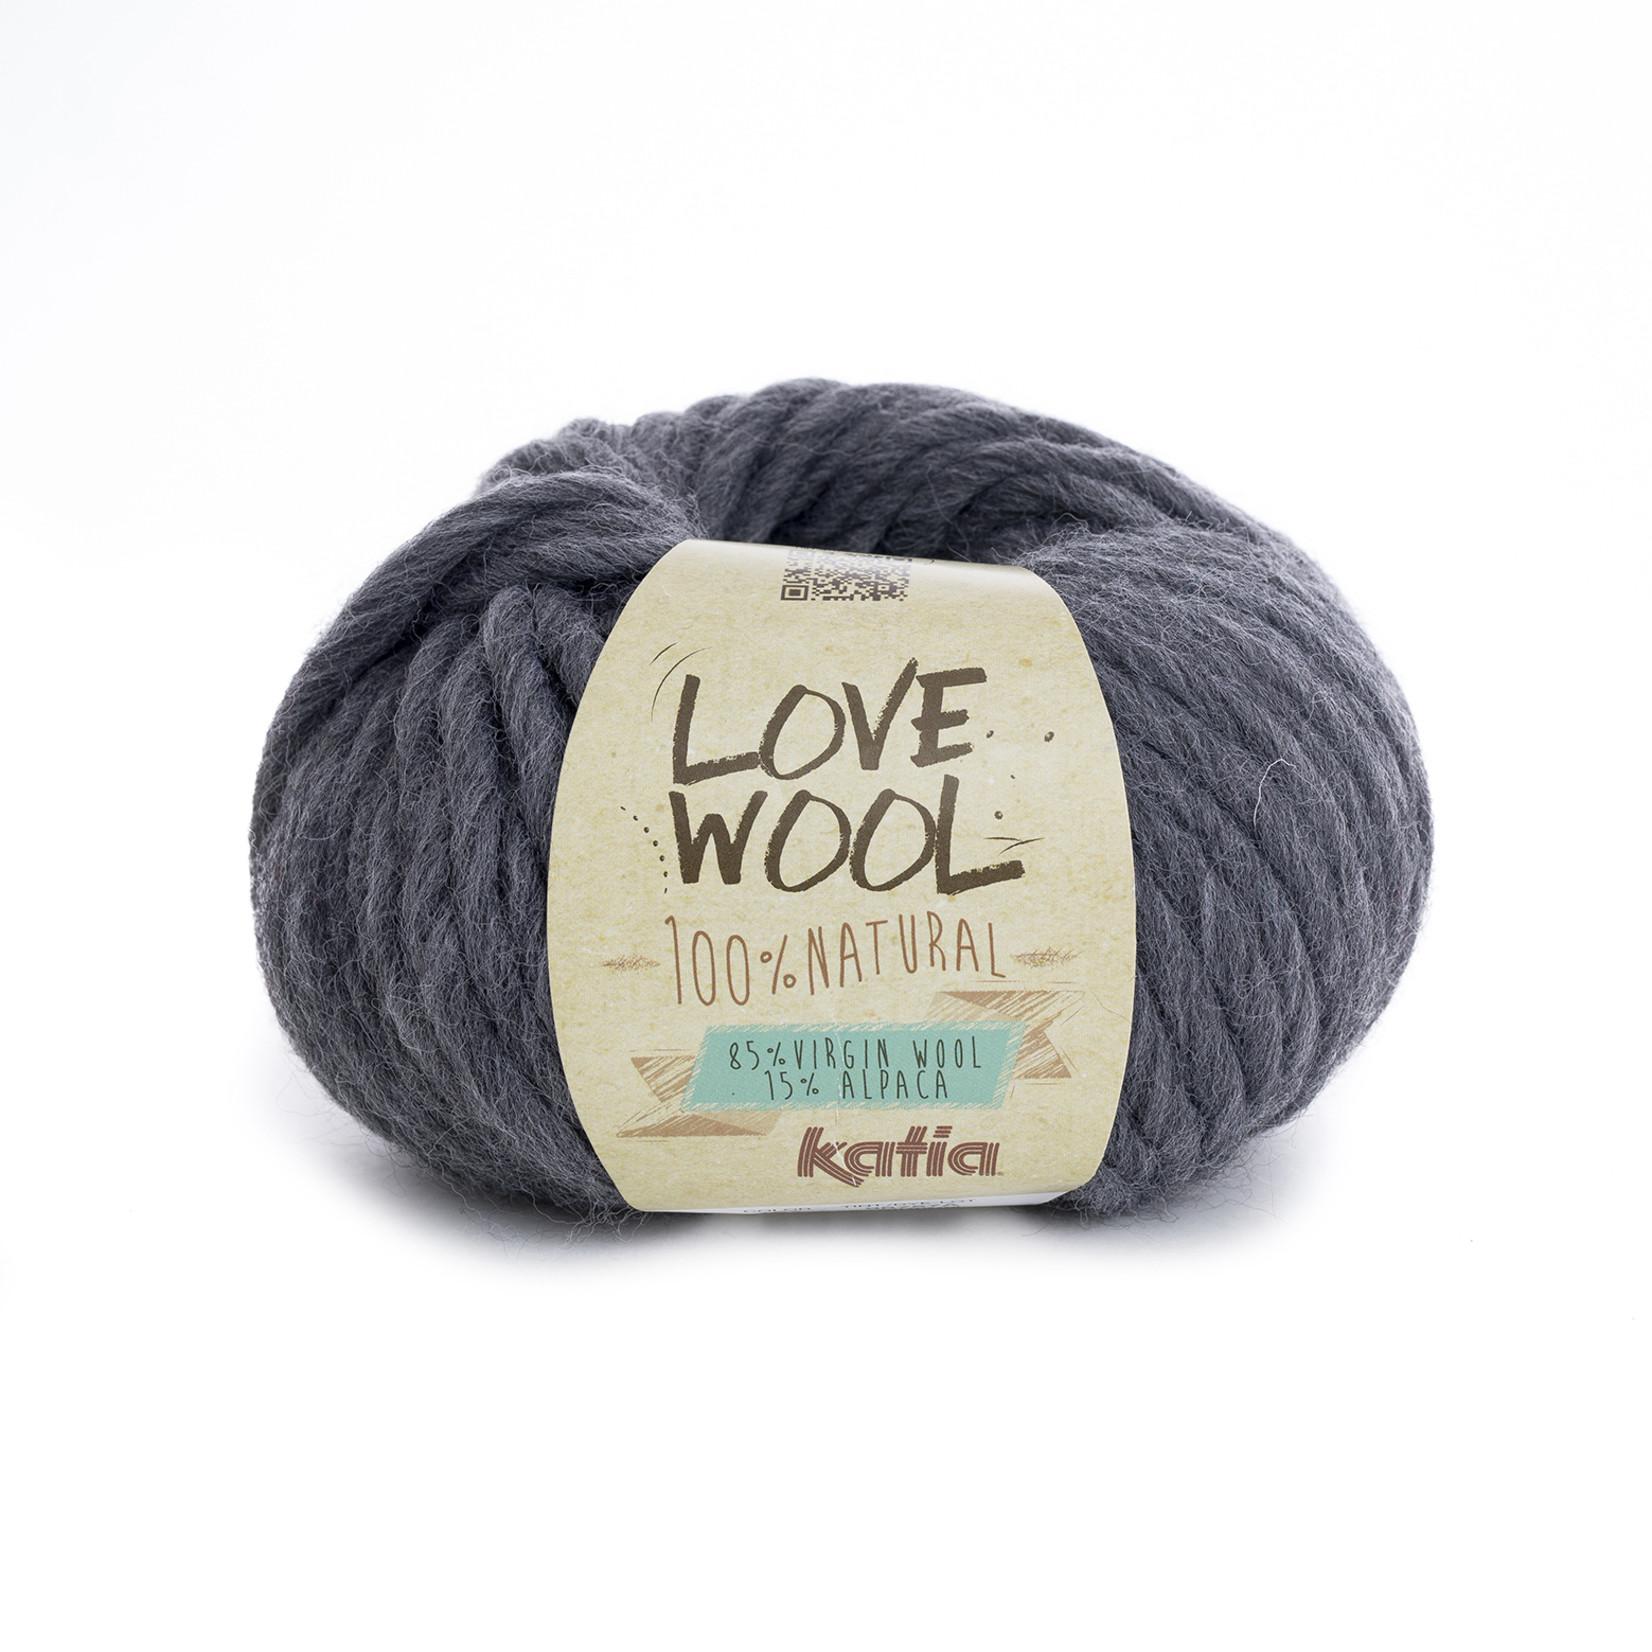 Katia Katia - Love Wool - kleur 107 - Grijs - 100 gr. = 50 m.